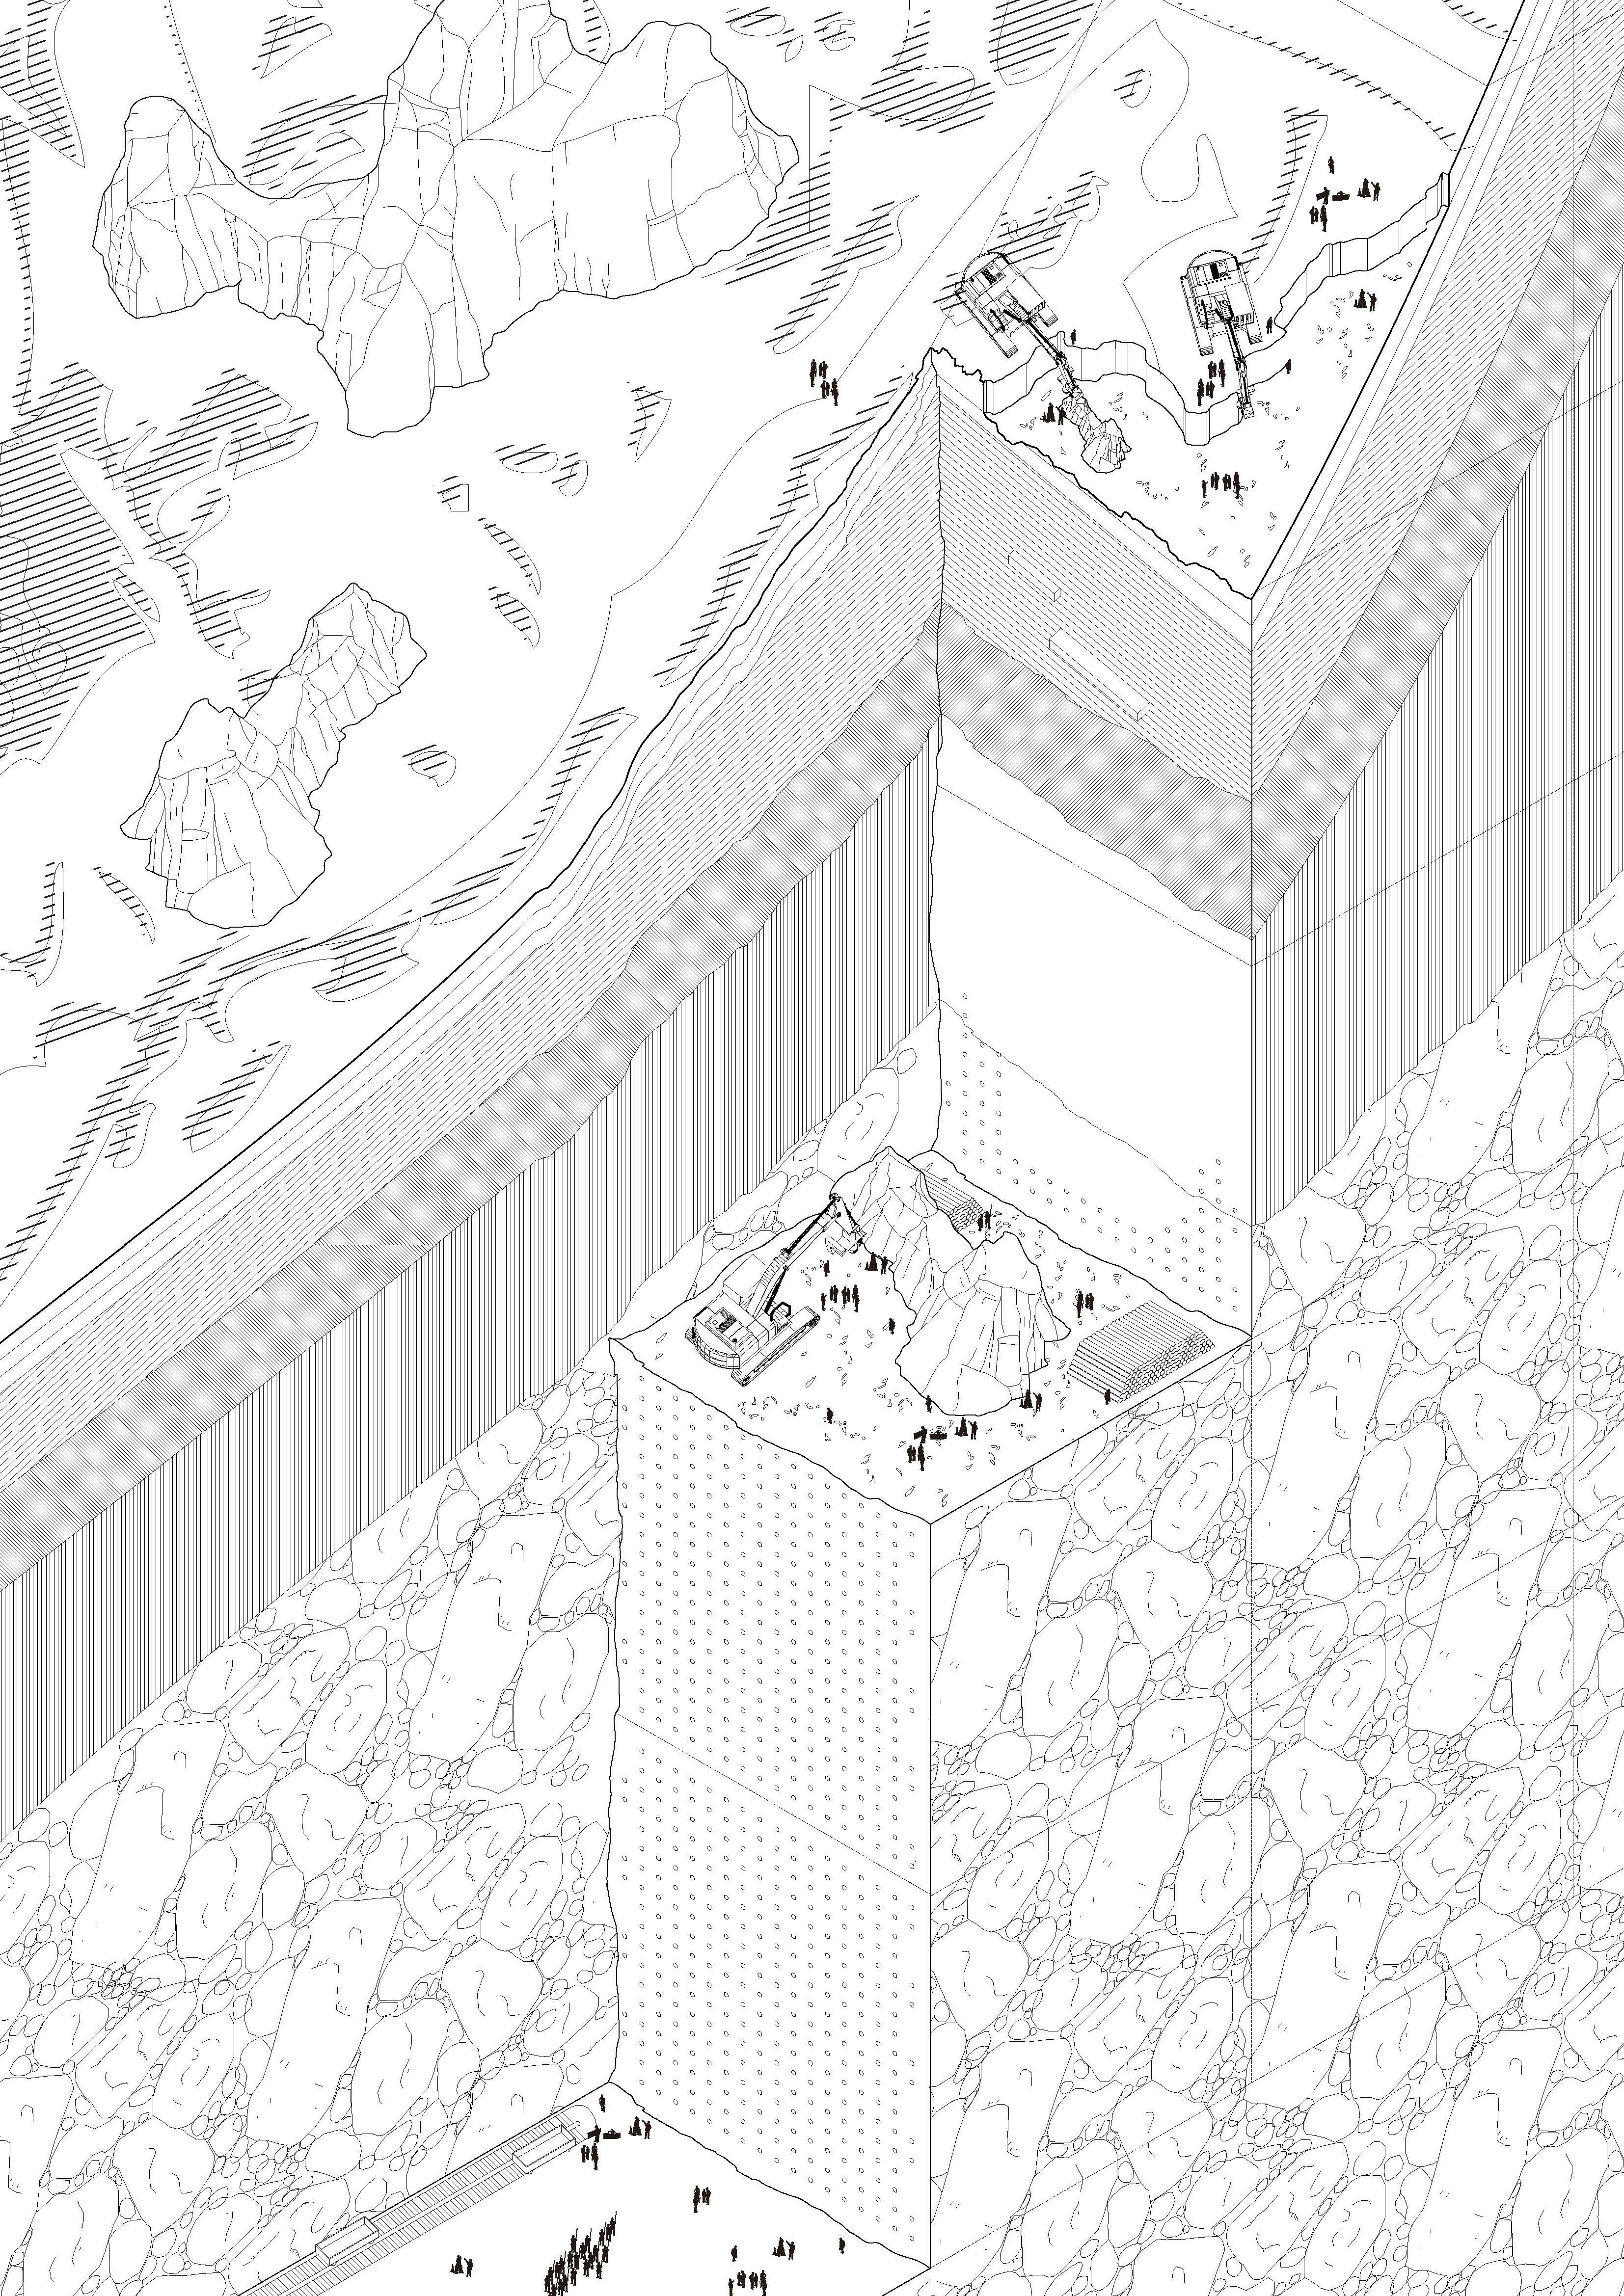 140422_a2_mountainexcavationprocess